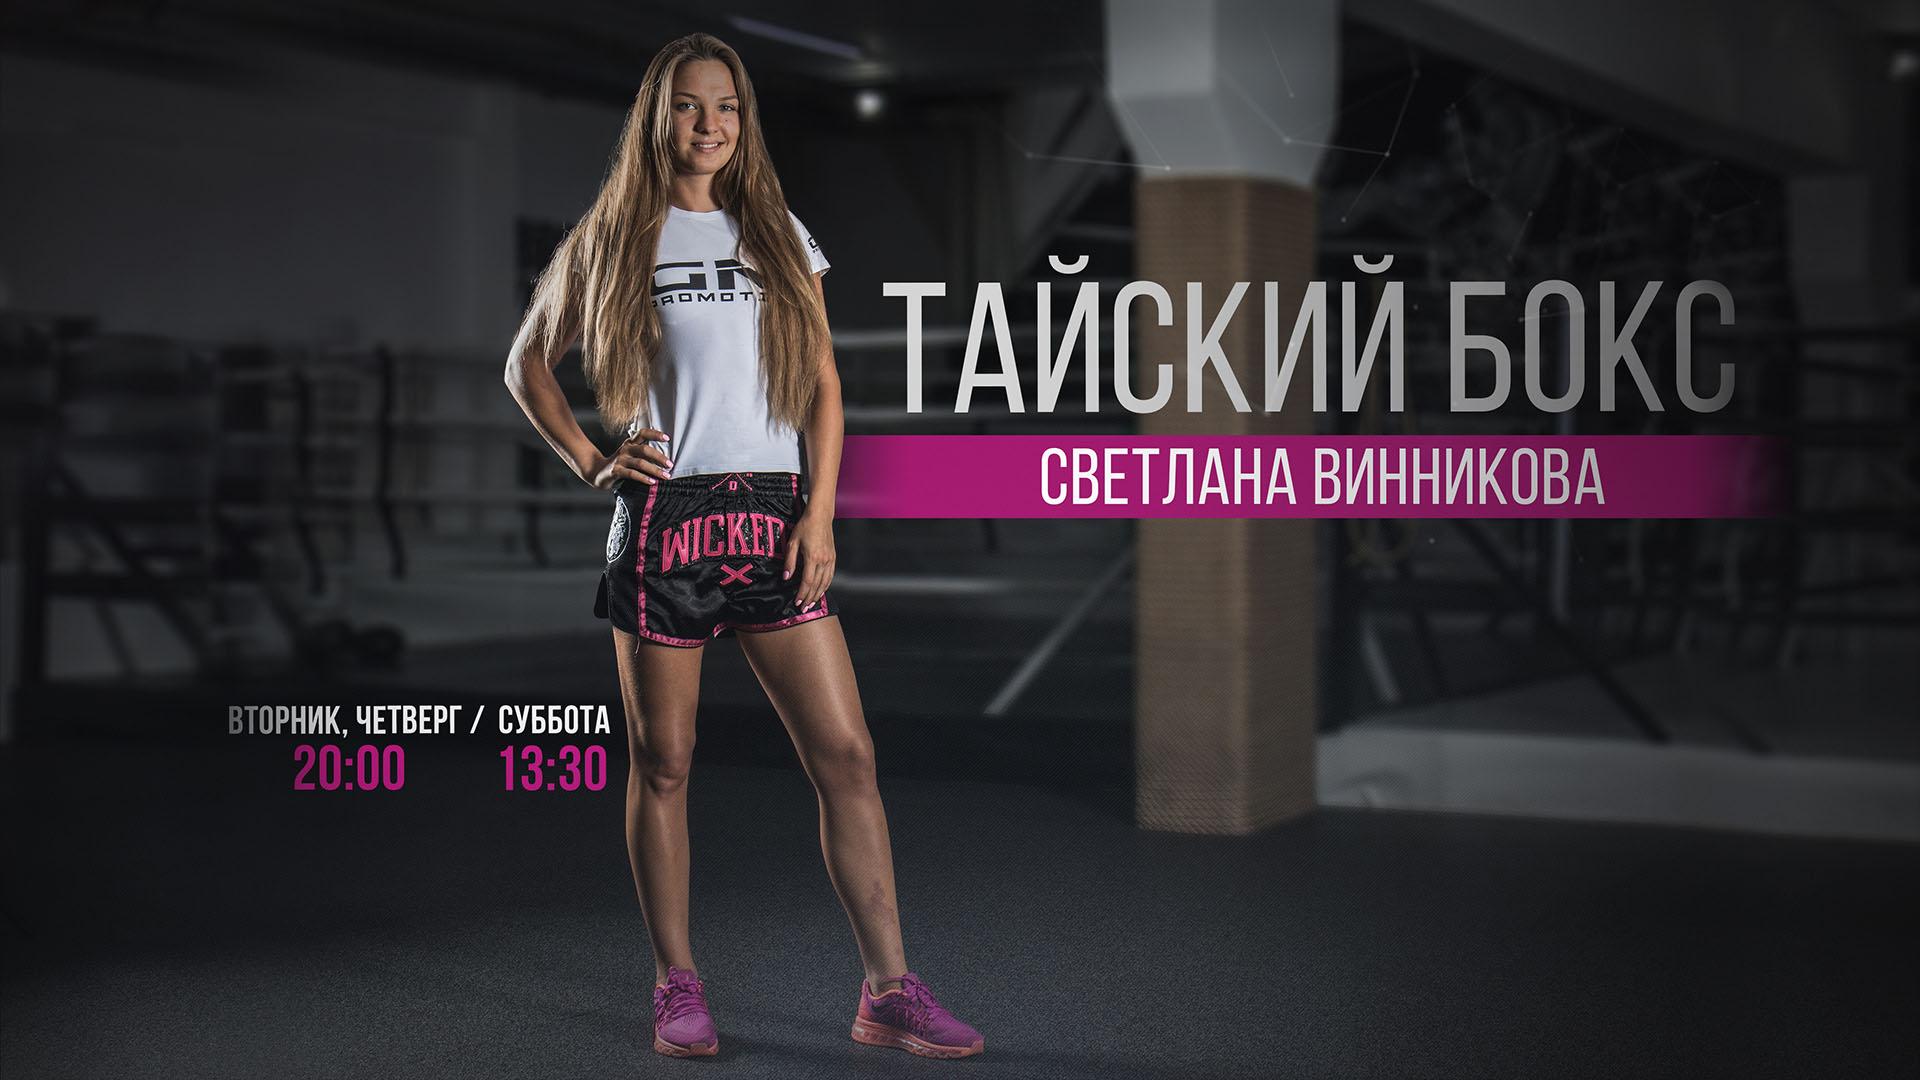 Тайский бокс (Винникова) 20